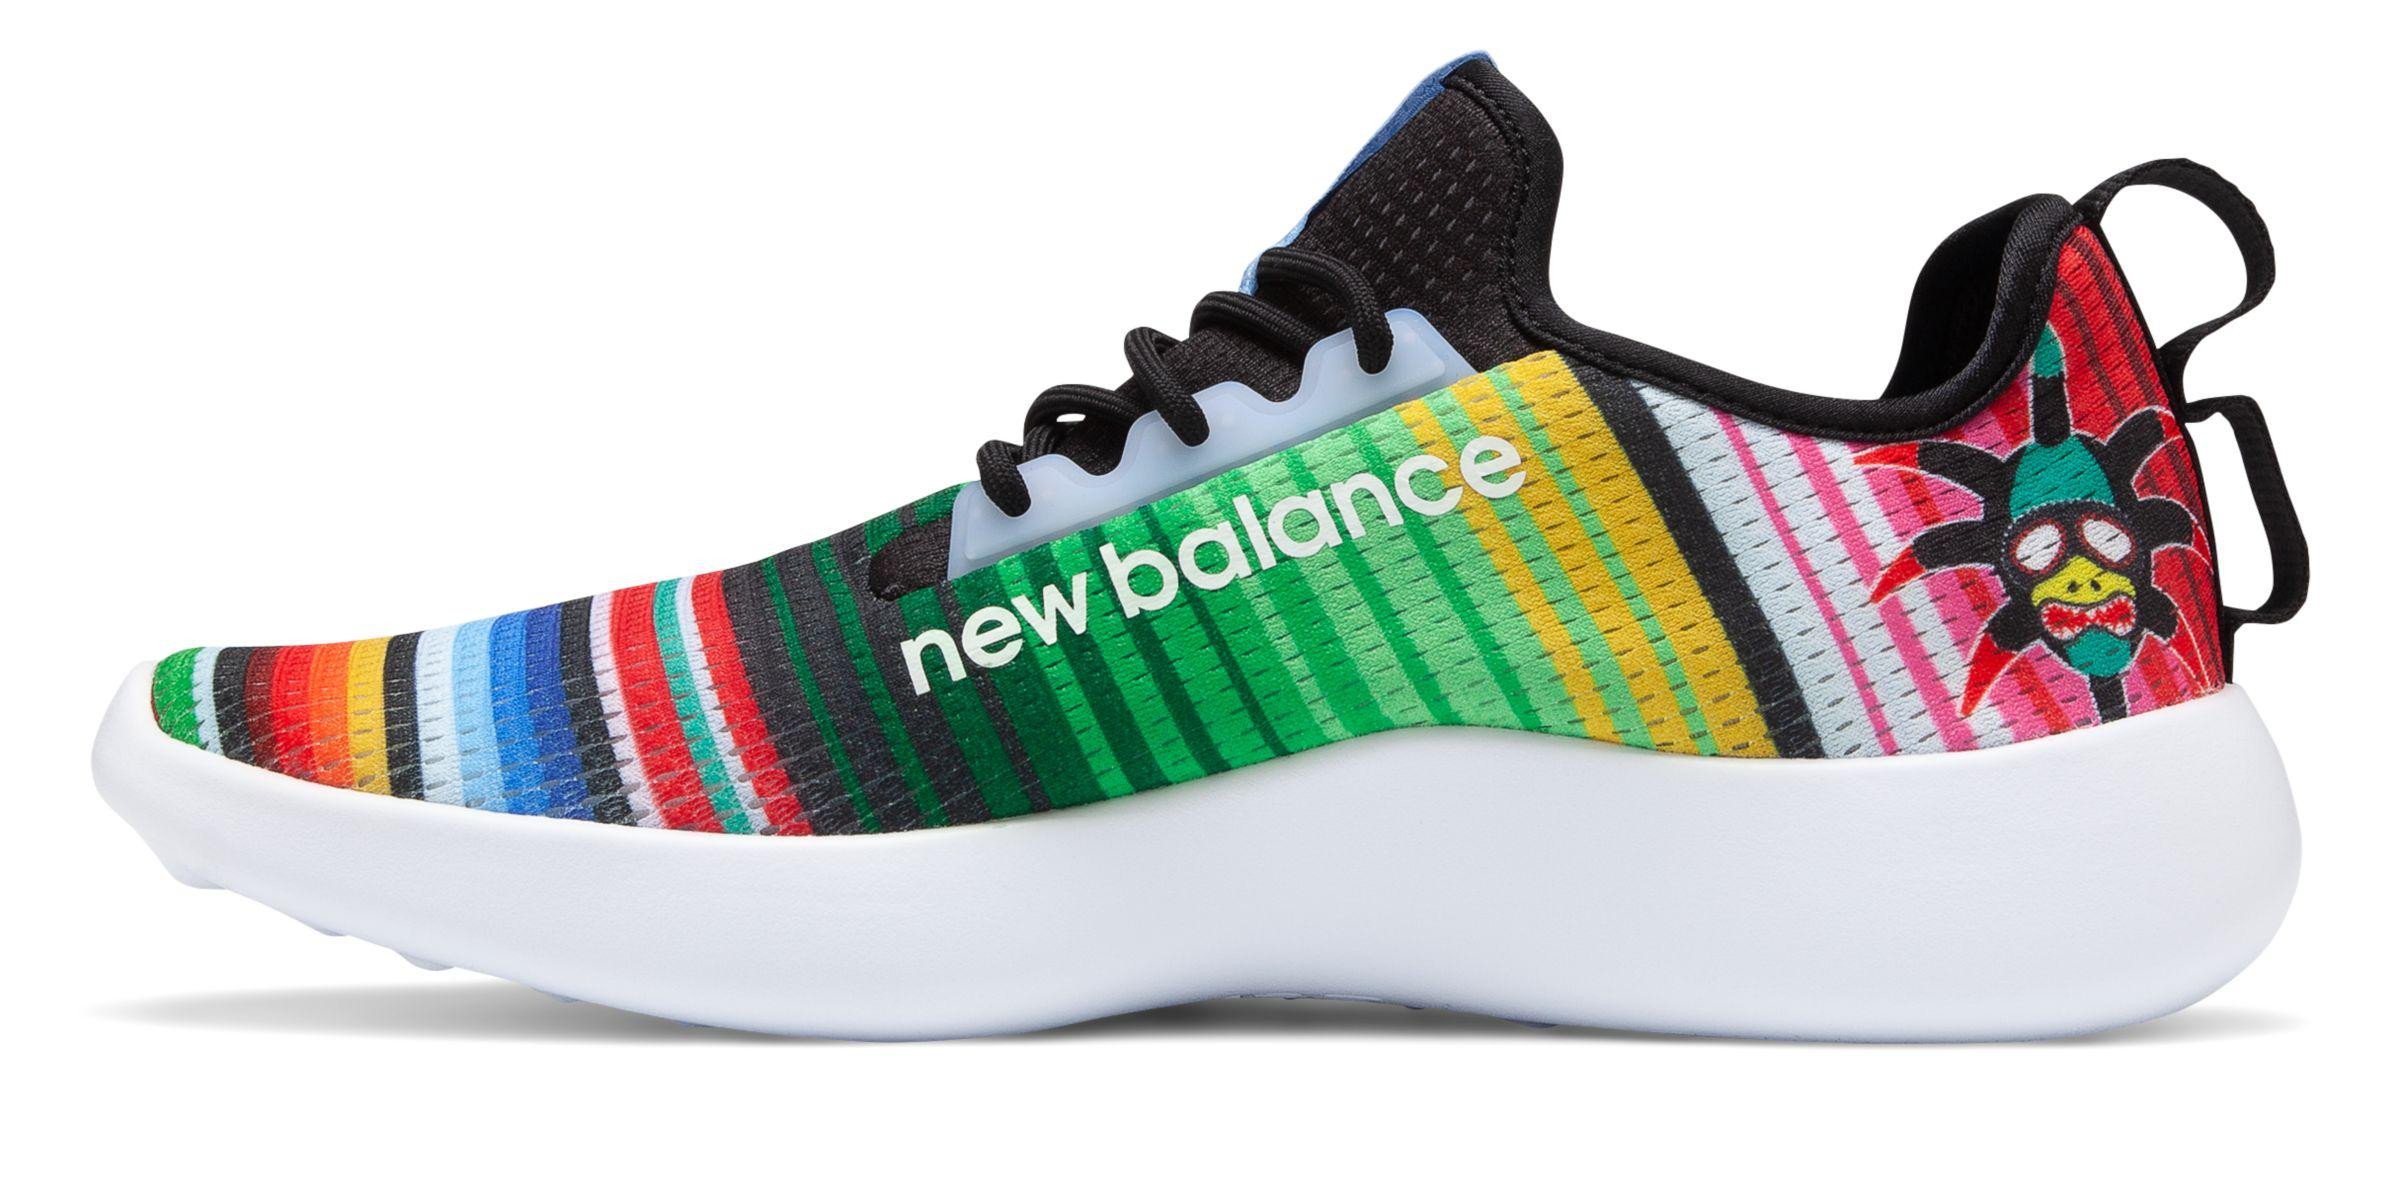 New Balance Recovery V1 Lacrosse Shoe